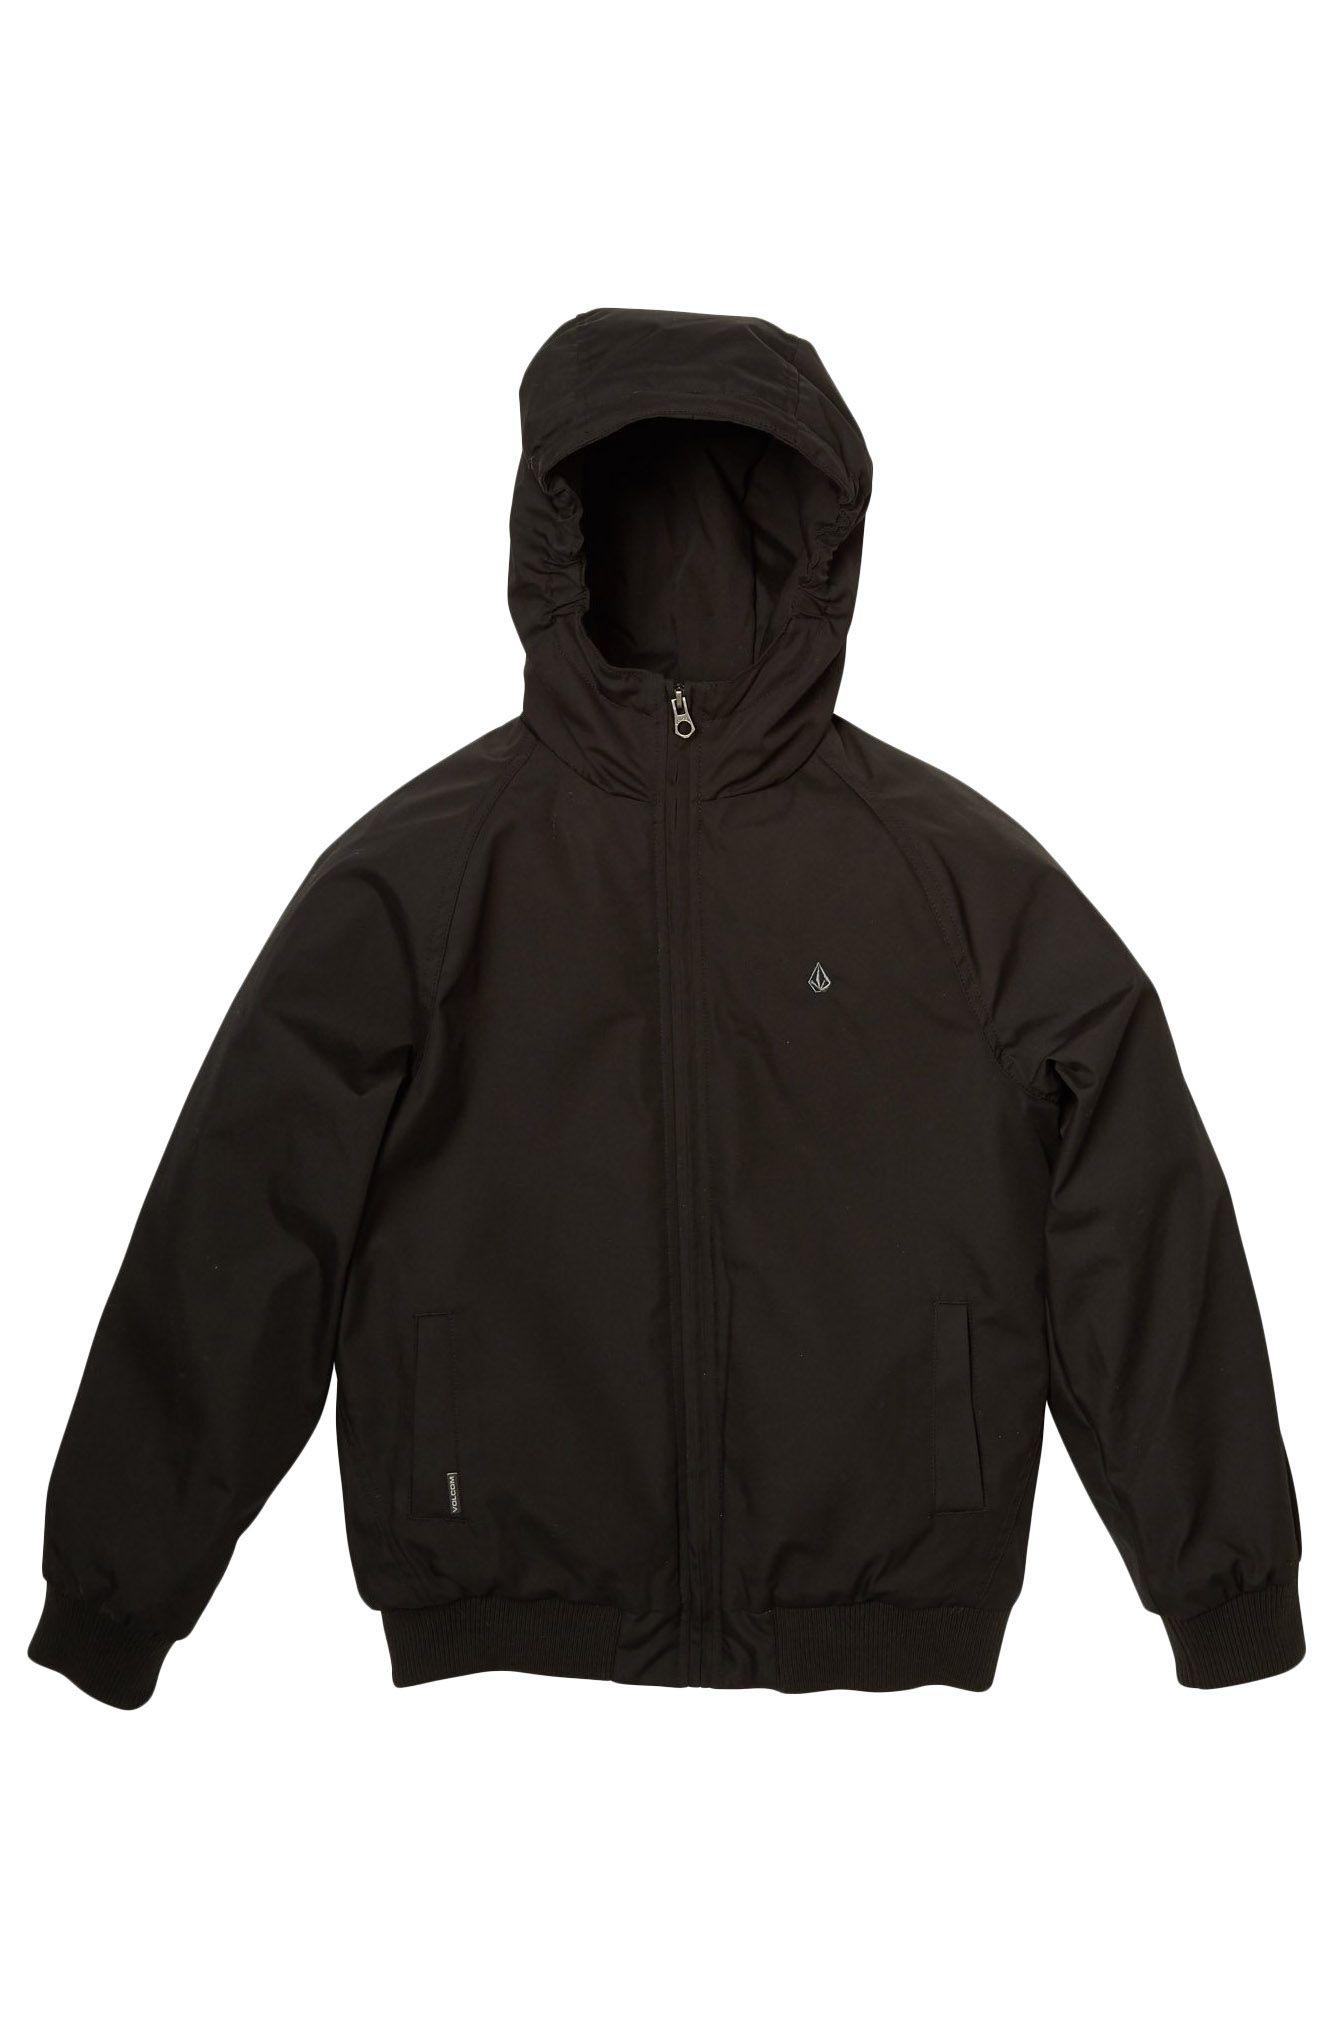 Volcom Jacket HERNAN 5K JACKET Black